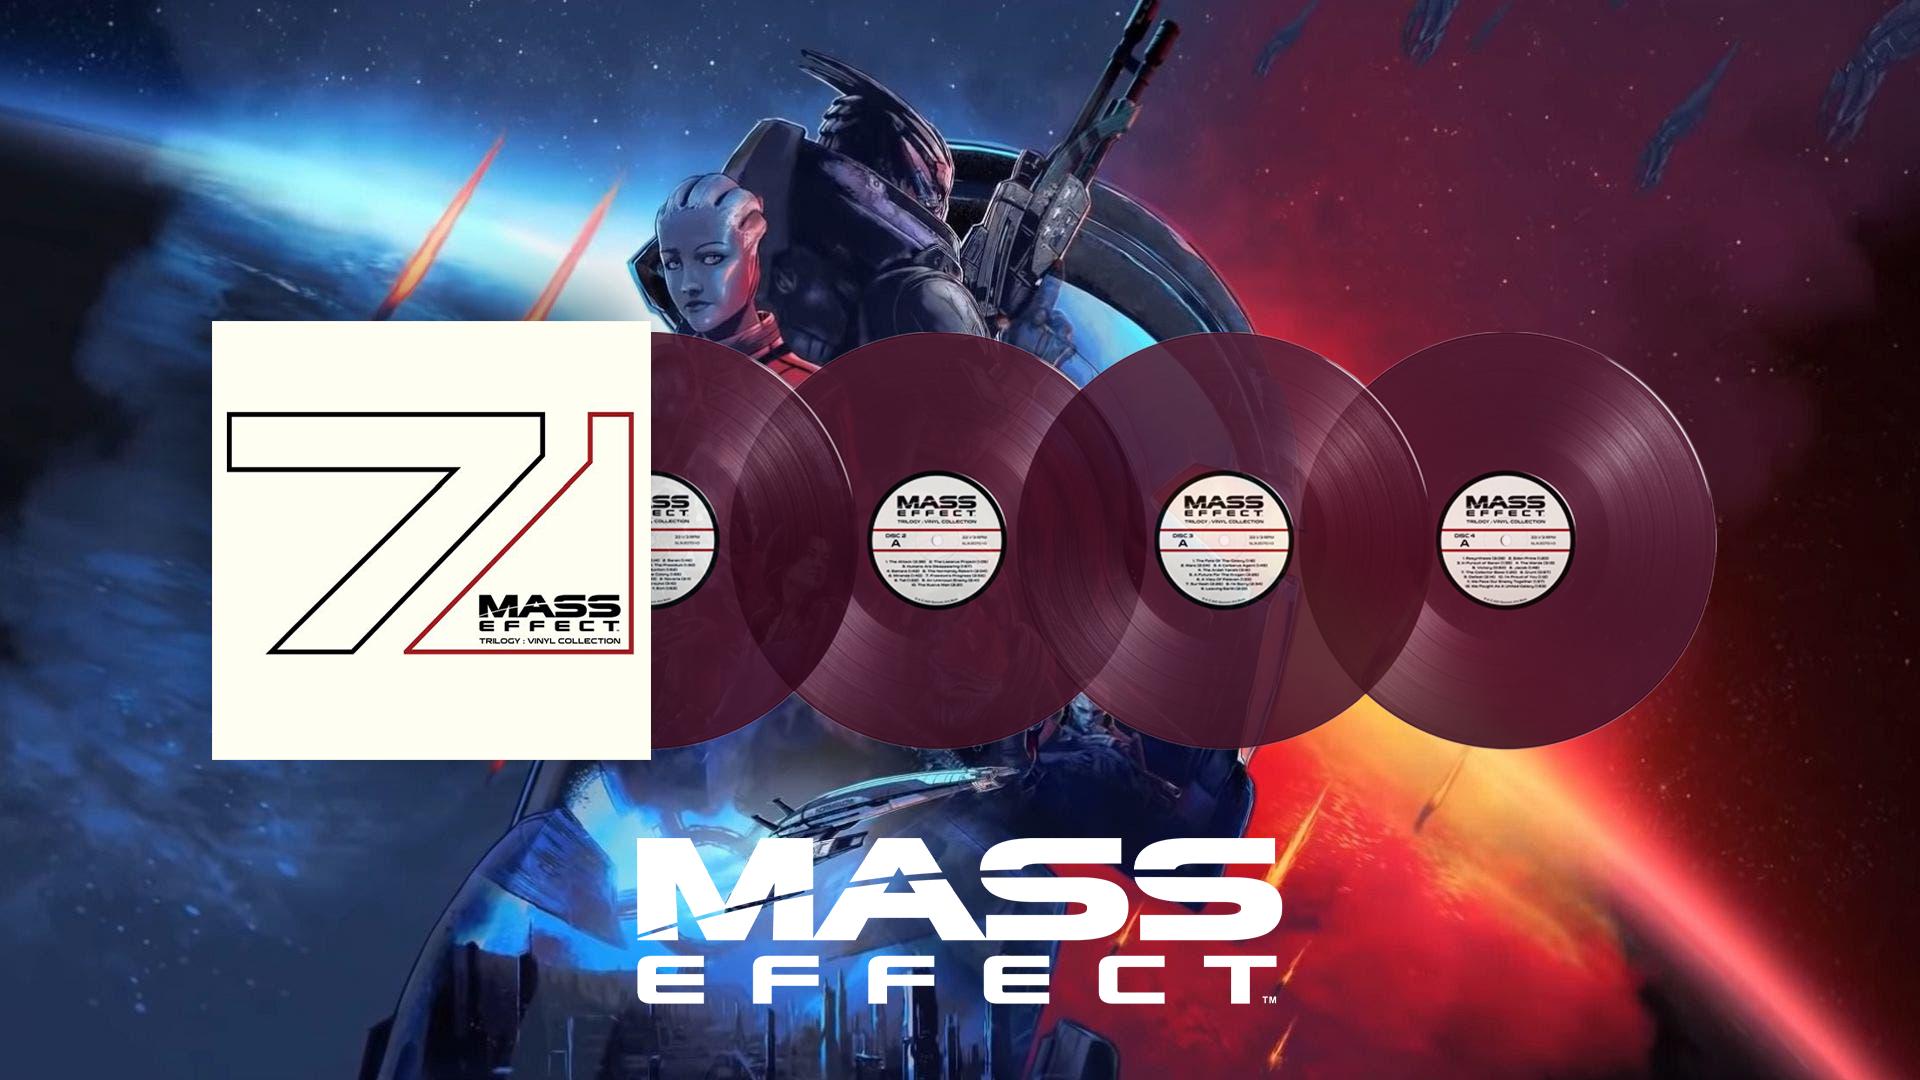 Mass-effect_Visuel_vitrine_2